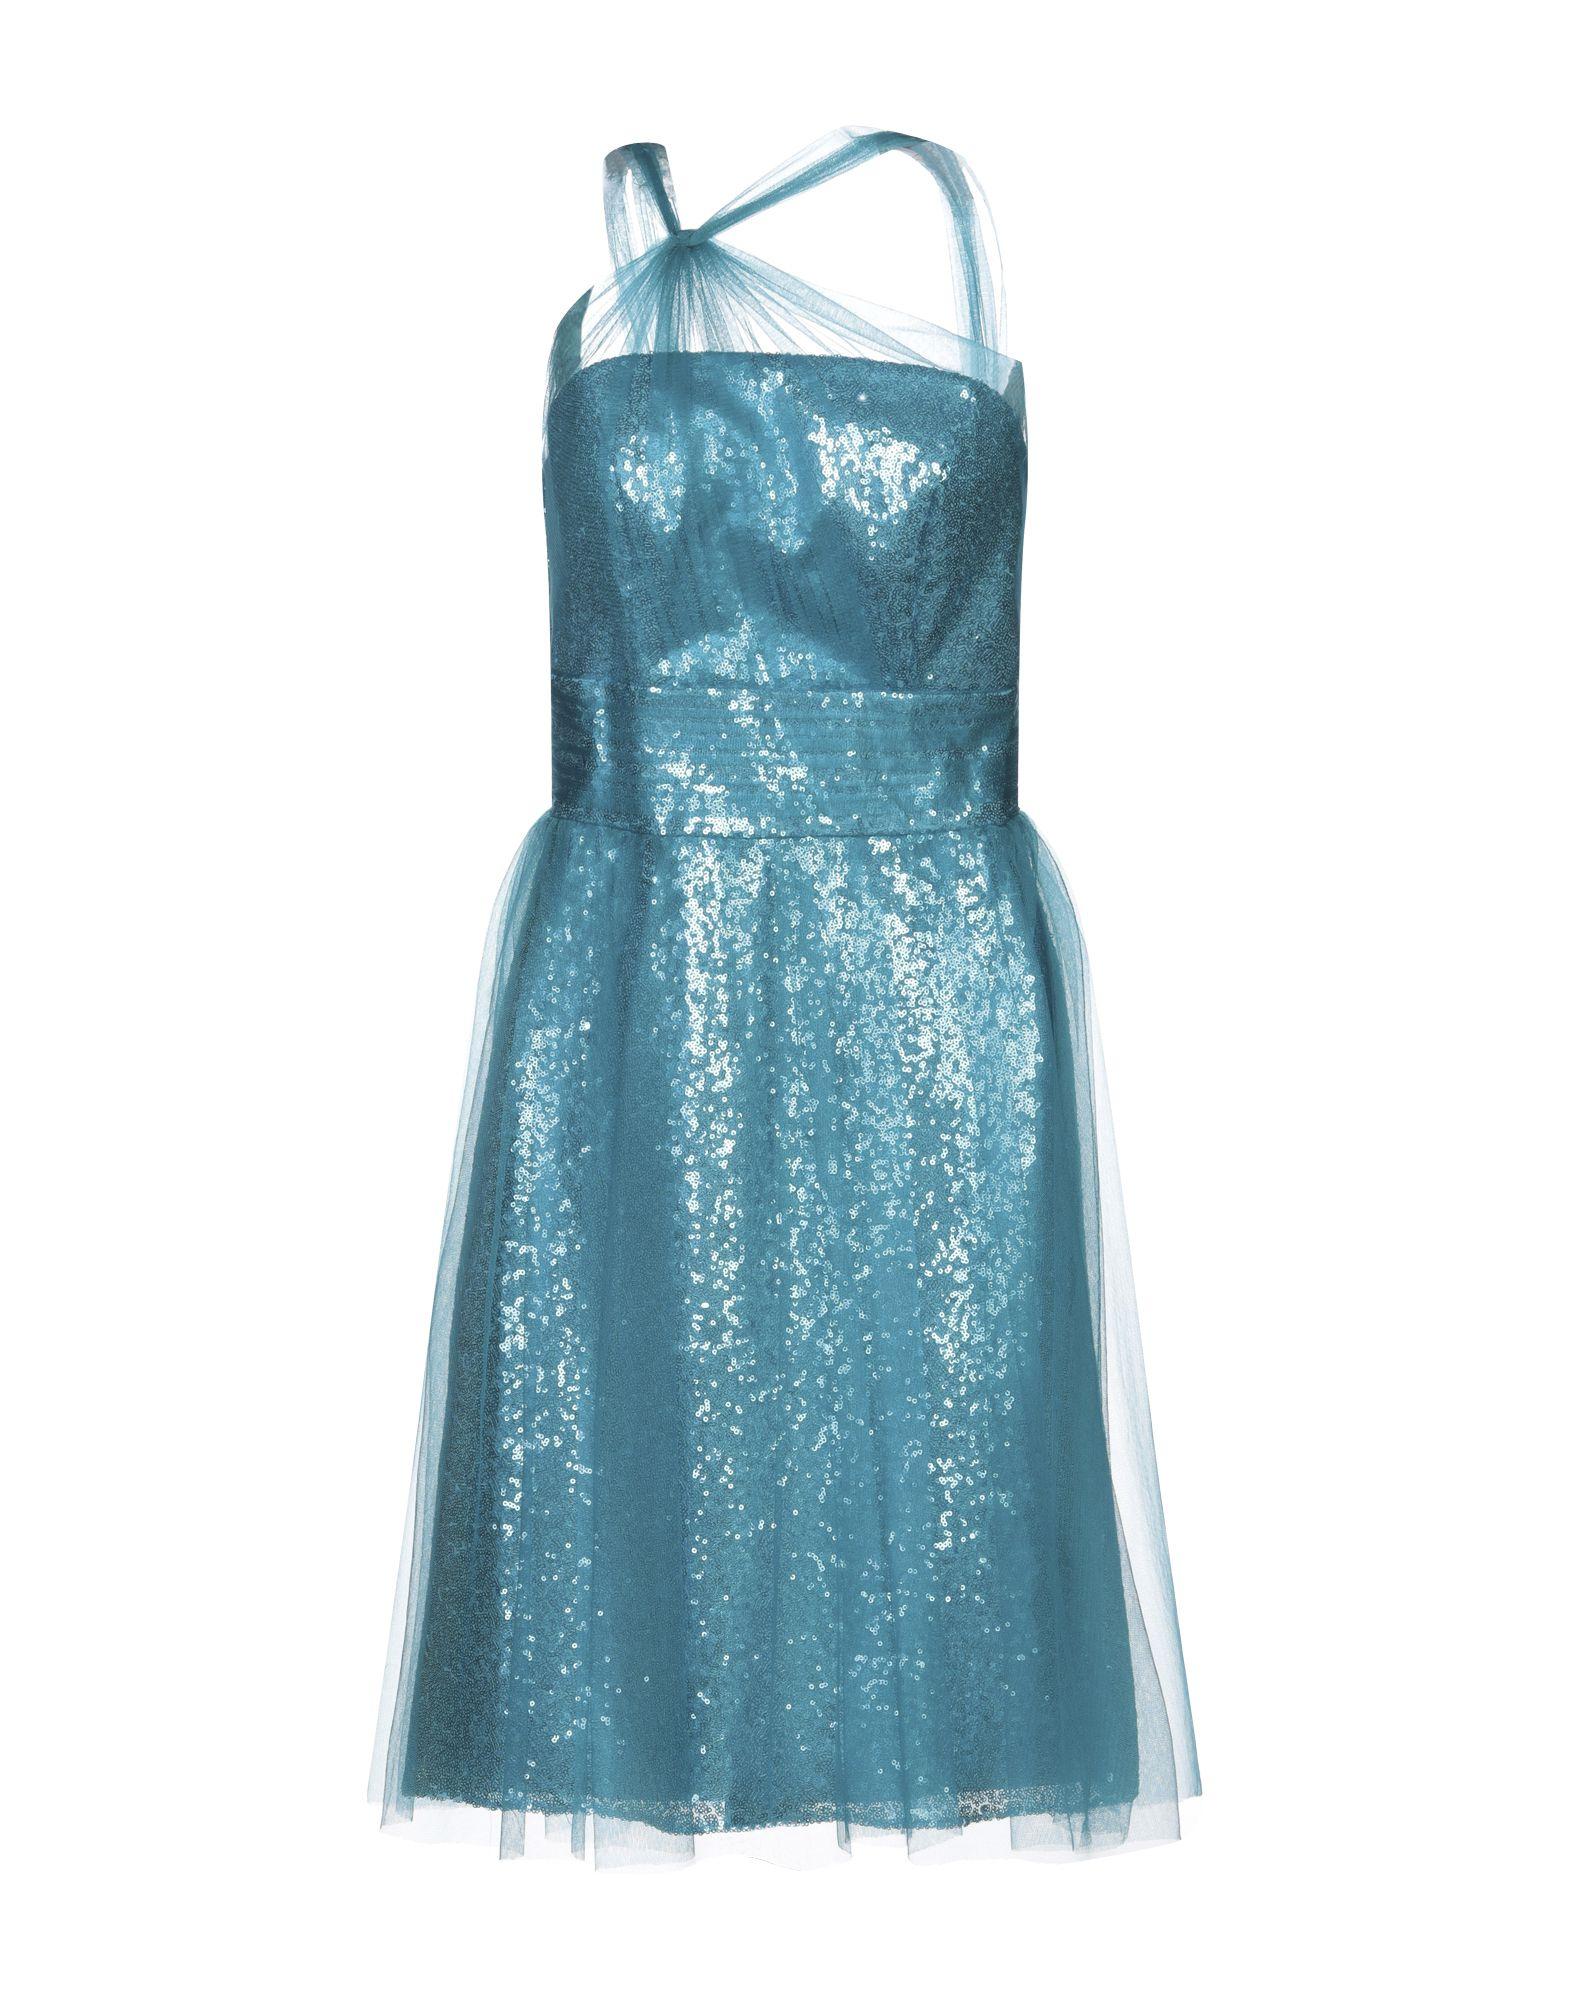 BELLA RHAPSODY by VENUS BRIDAL Платье до колена